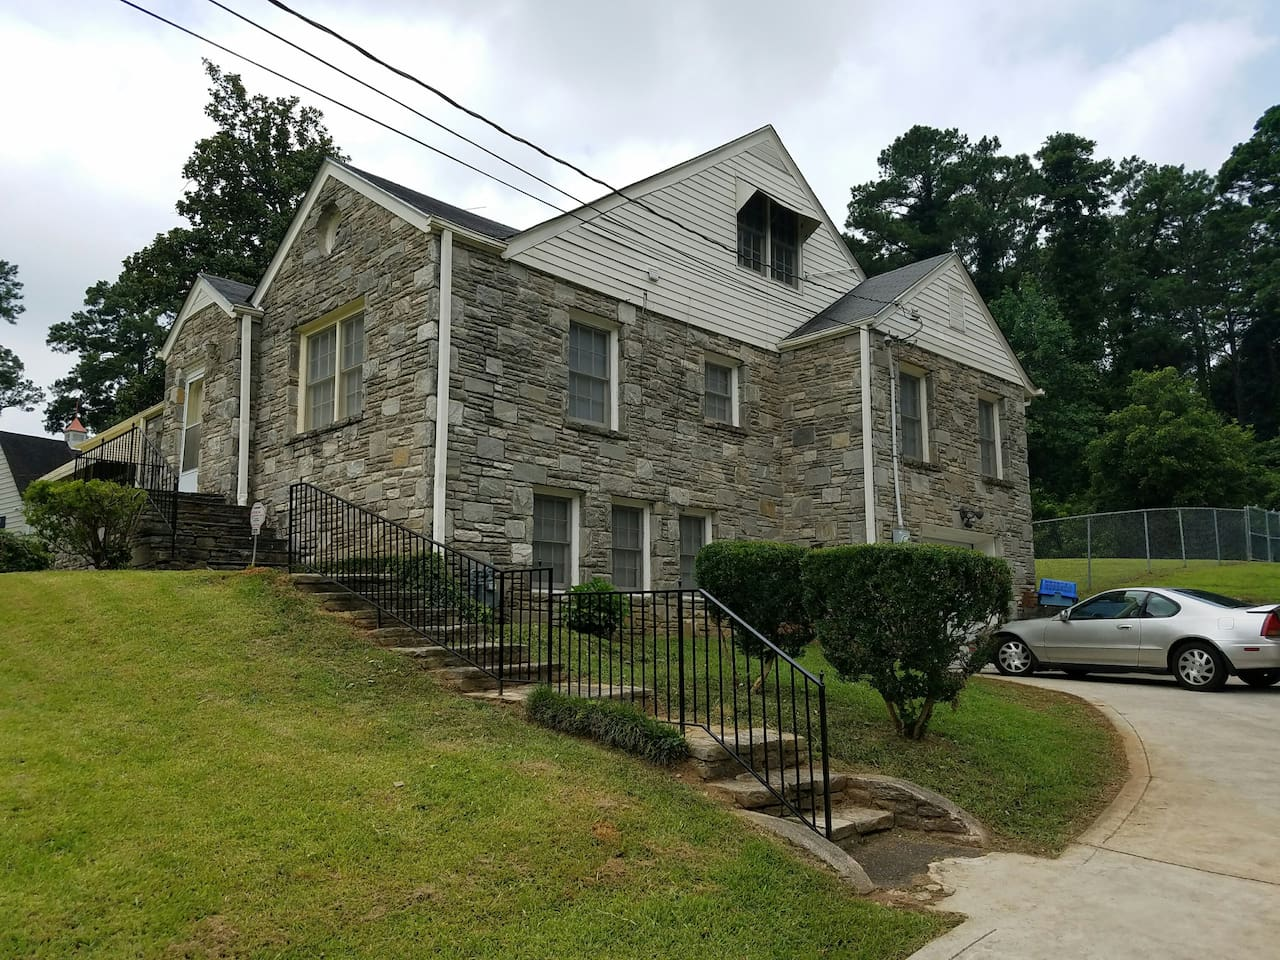 Historic Stone Nostalgic Home Nestled with Modern Comforts